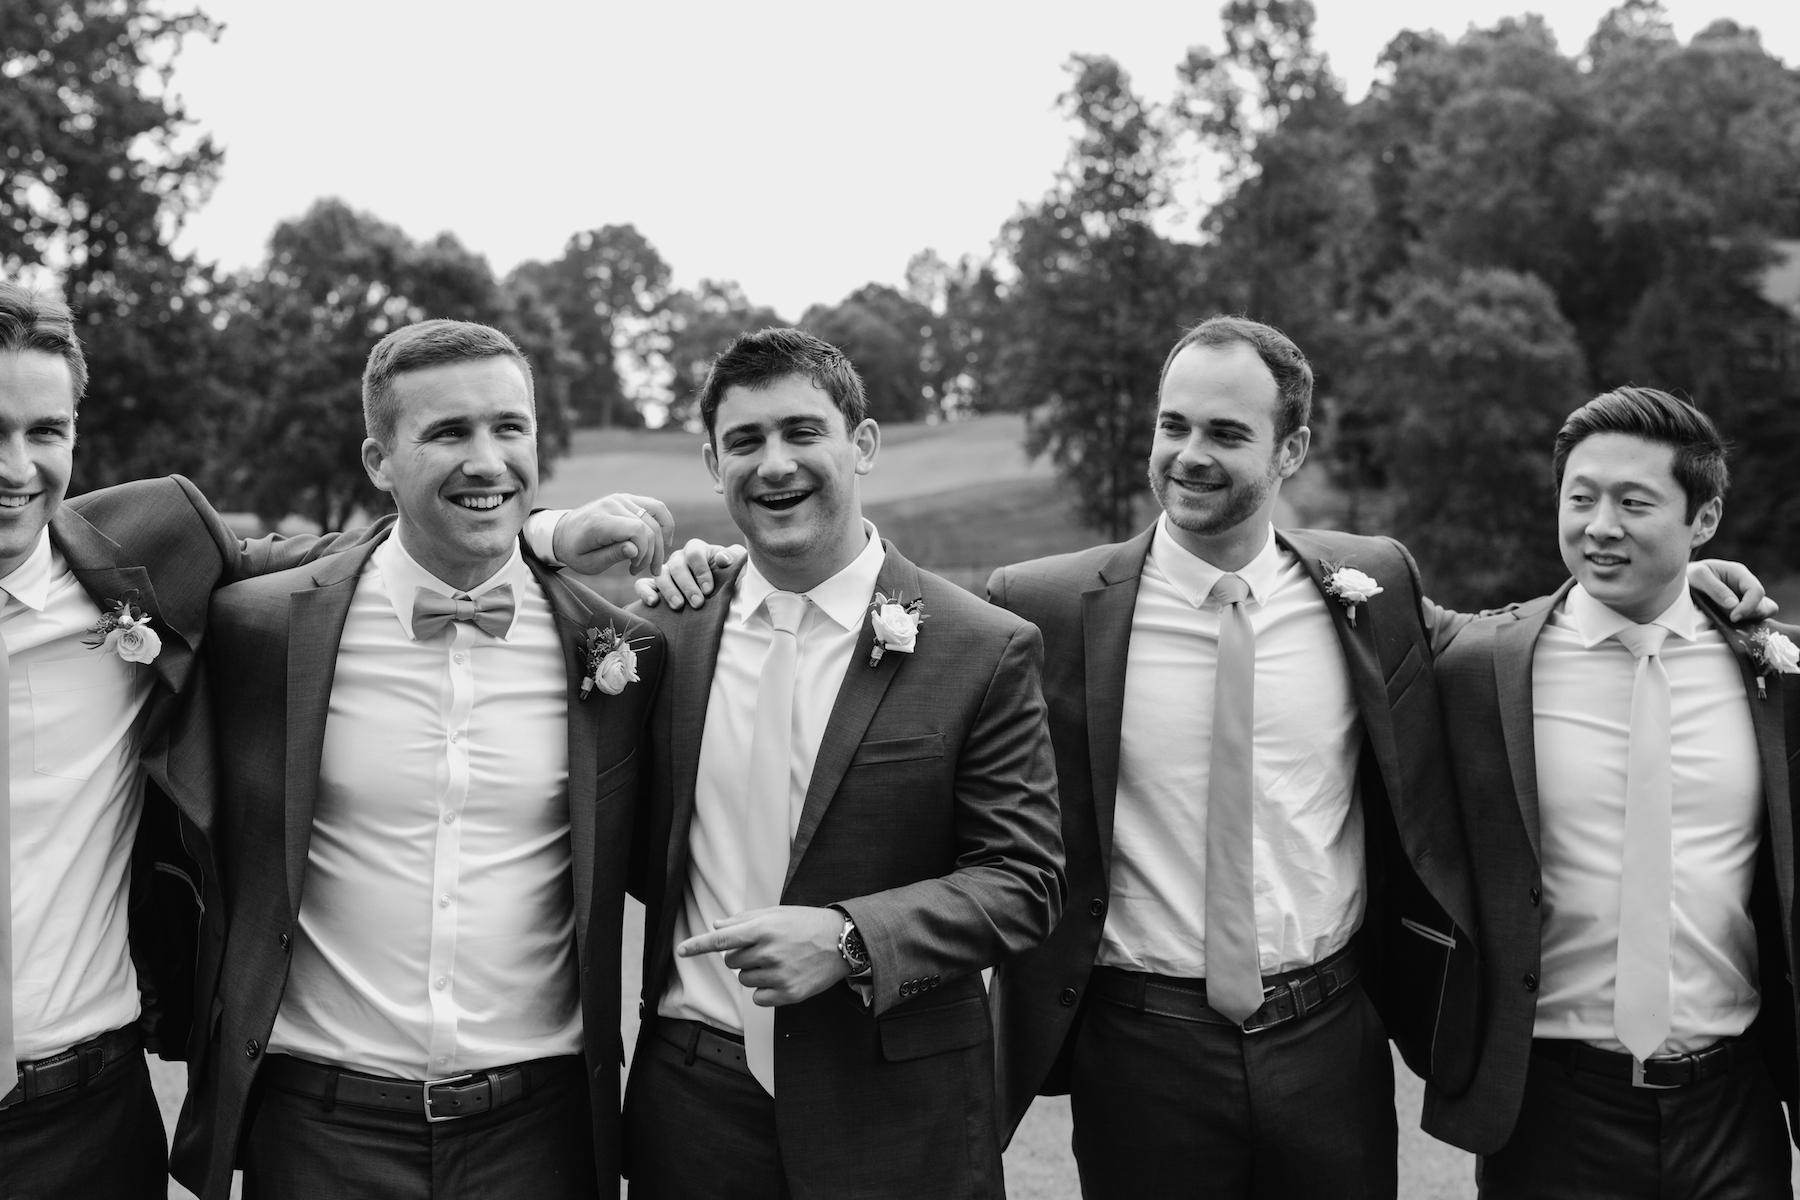 wedding-engagement-photographer-spartanburg-greenville-columbia-carolina-south-north-465.JPG